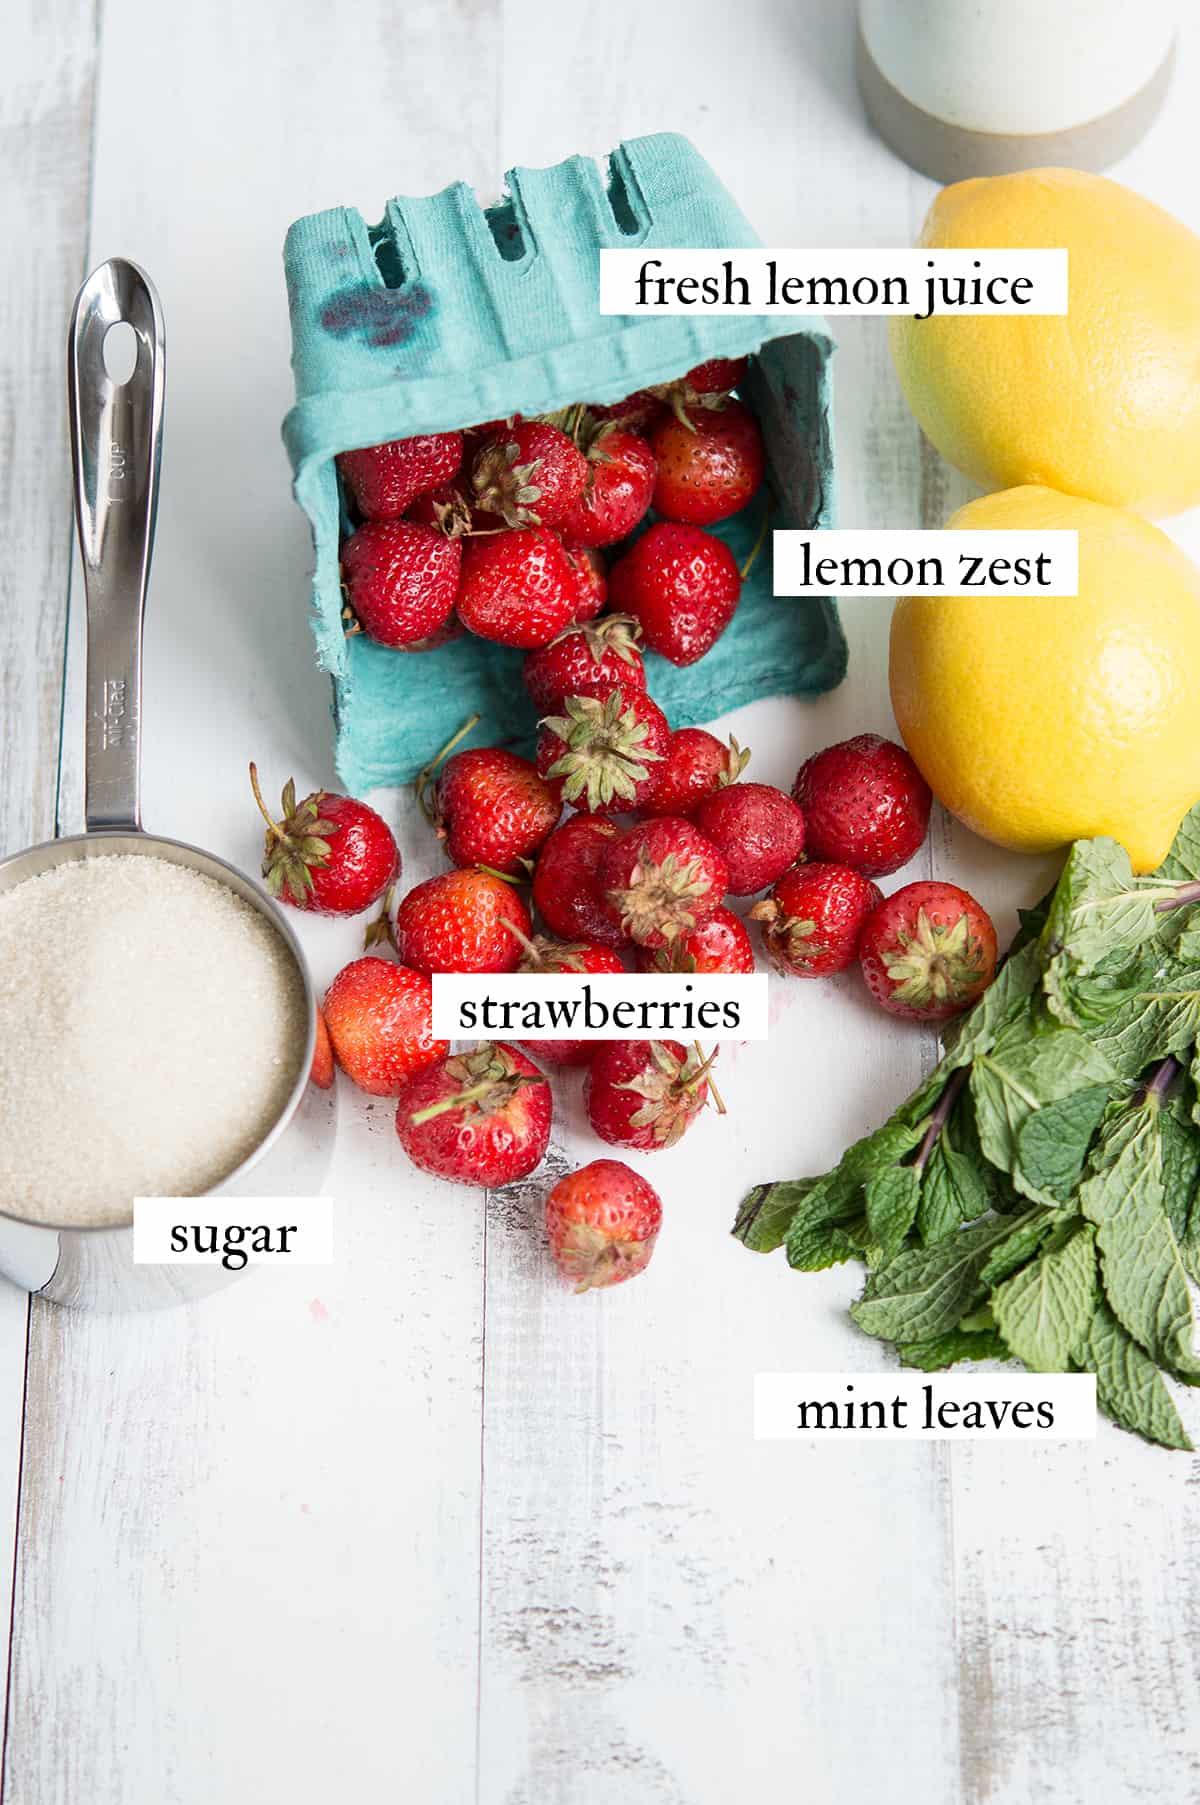 ingredients for strawberry lemon mint ice pops